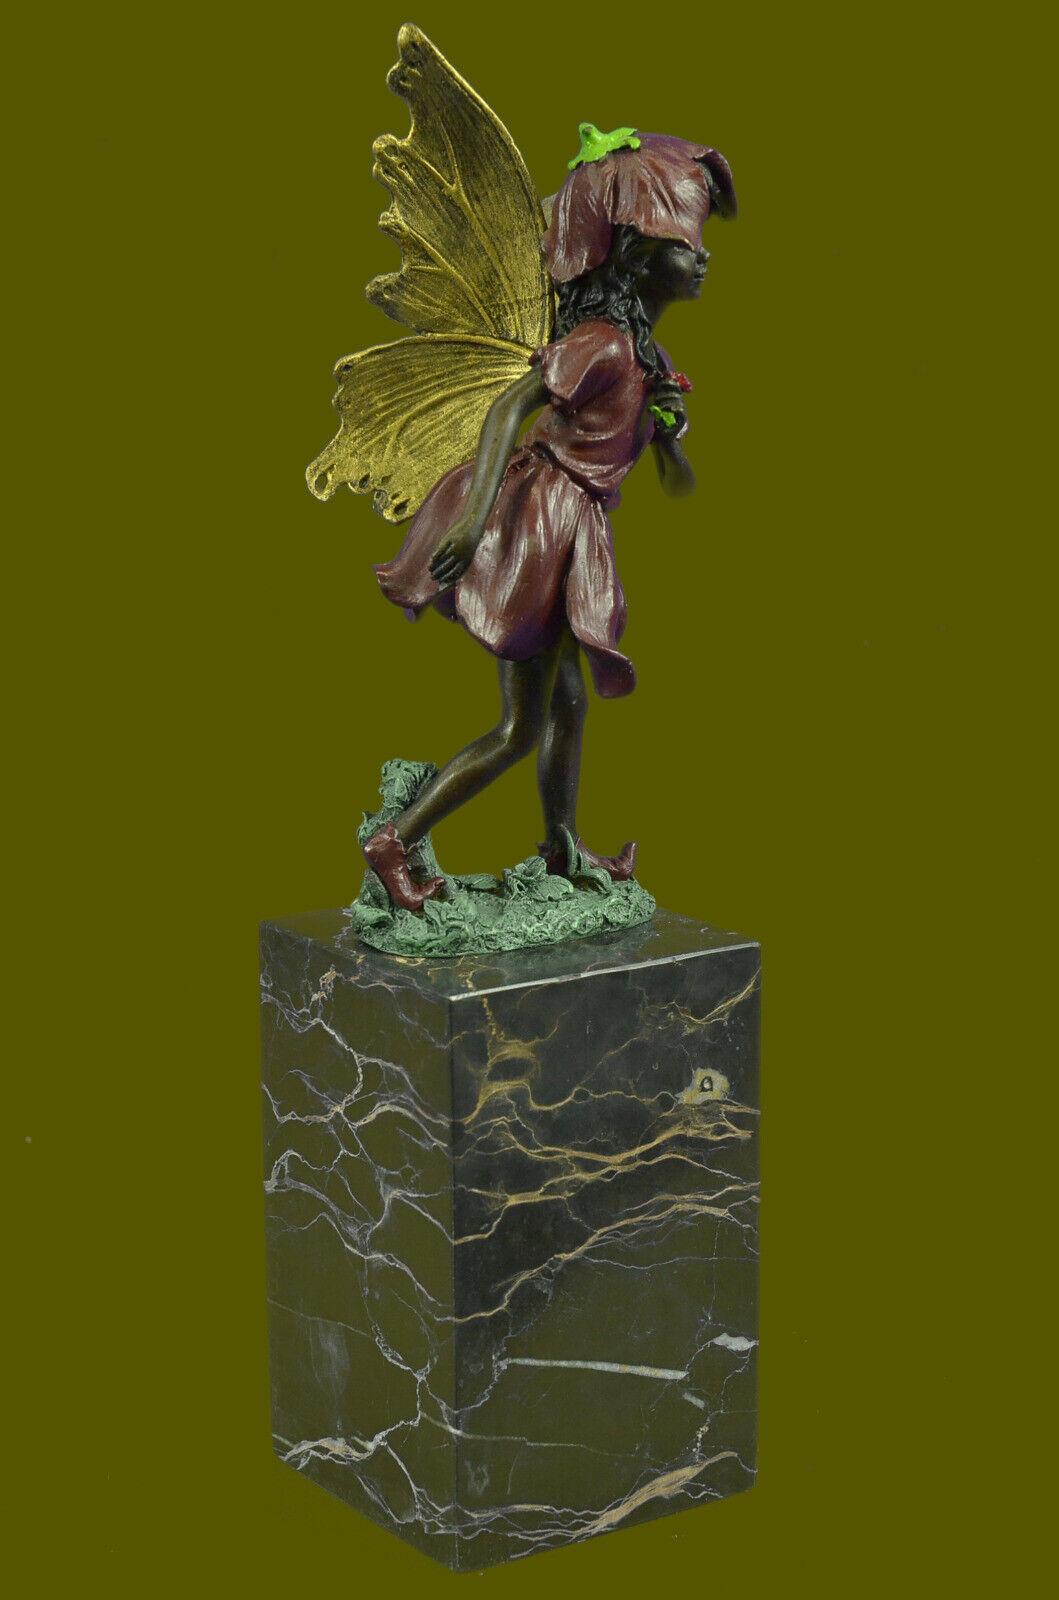 Купить Fairy Standing with a flower Garden Statue in aged bronze finish. 13 Tall Decor